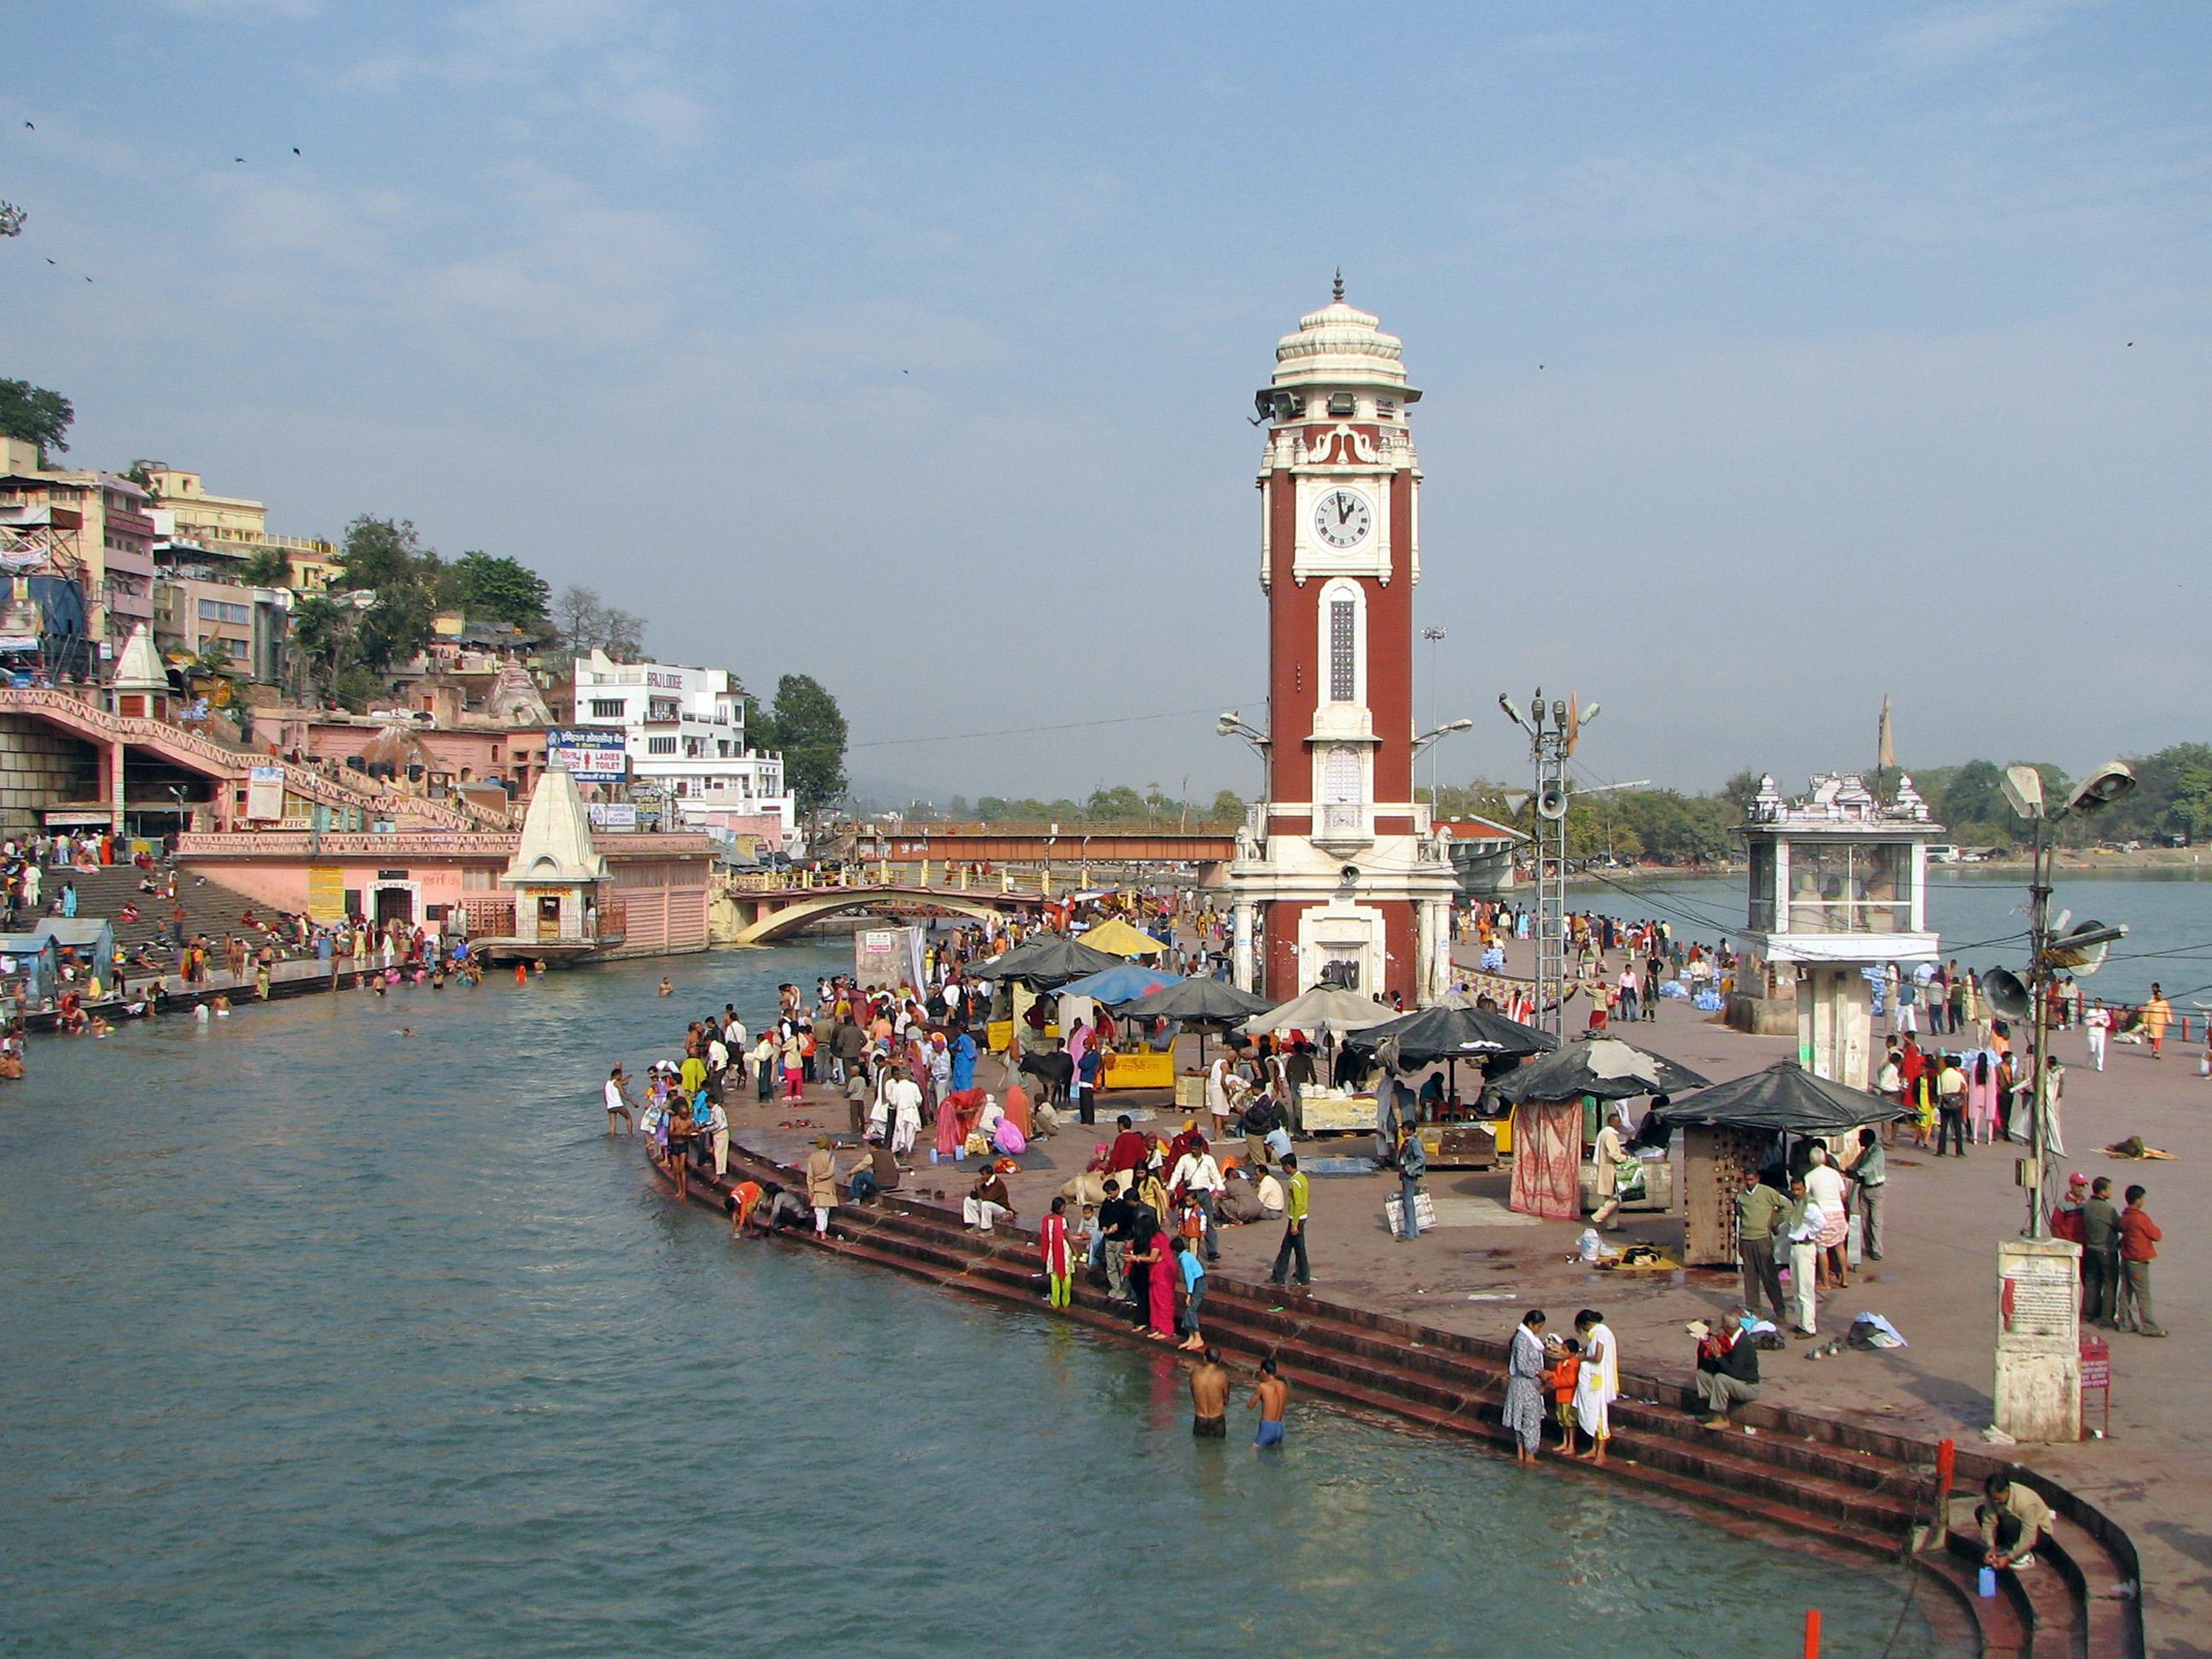 Uttarpradesh